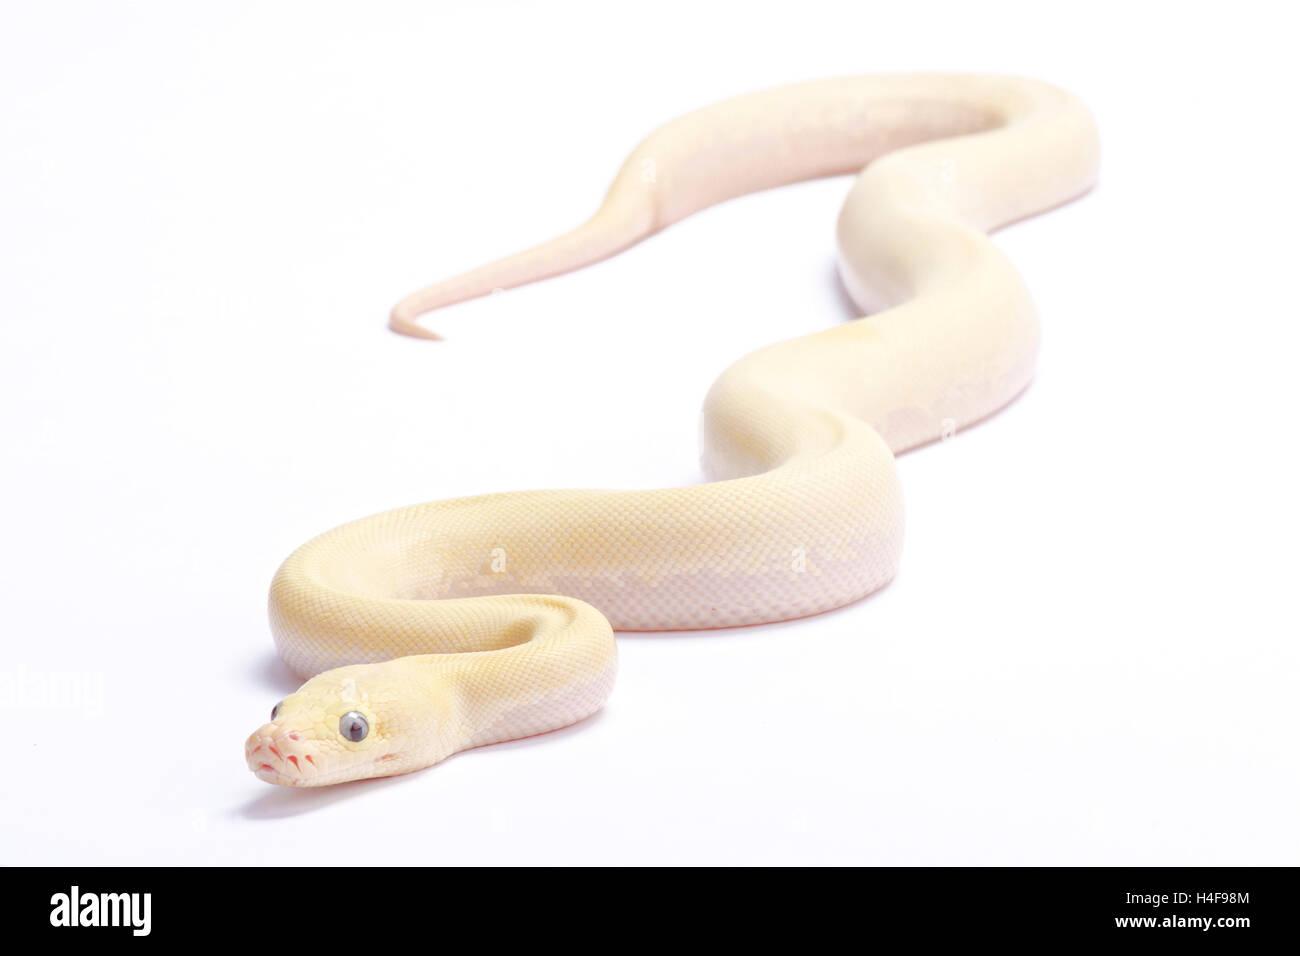 Burmese python,Python bivittatus,'ivory' - Stock Image